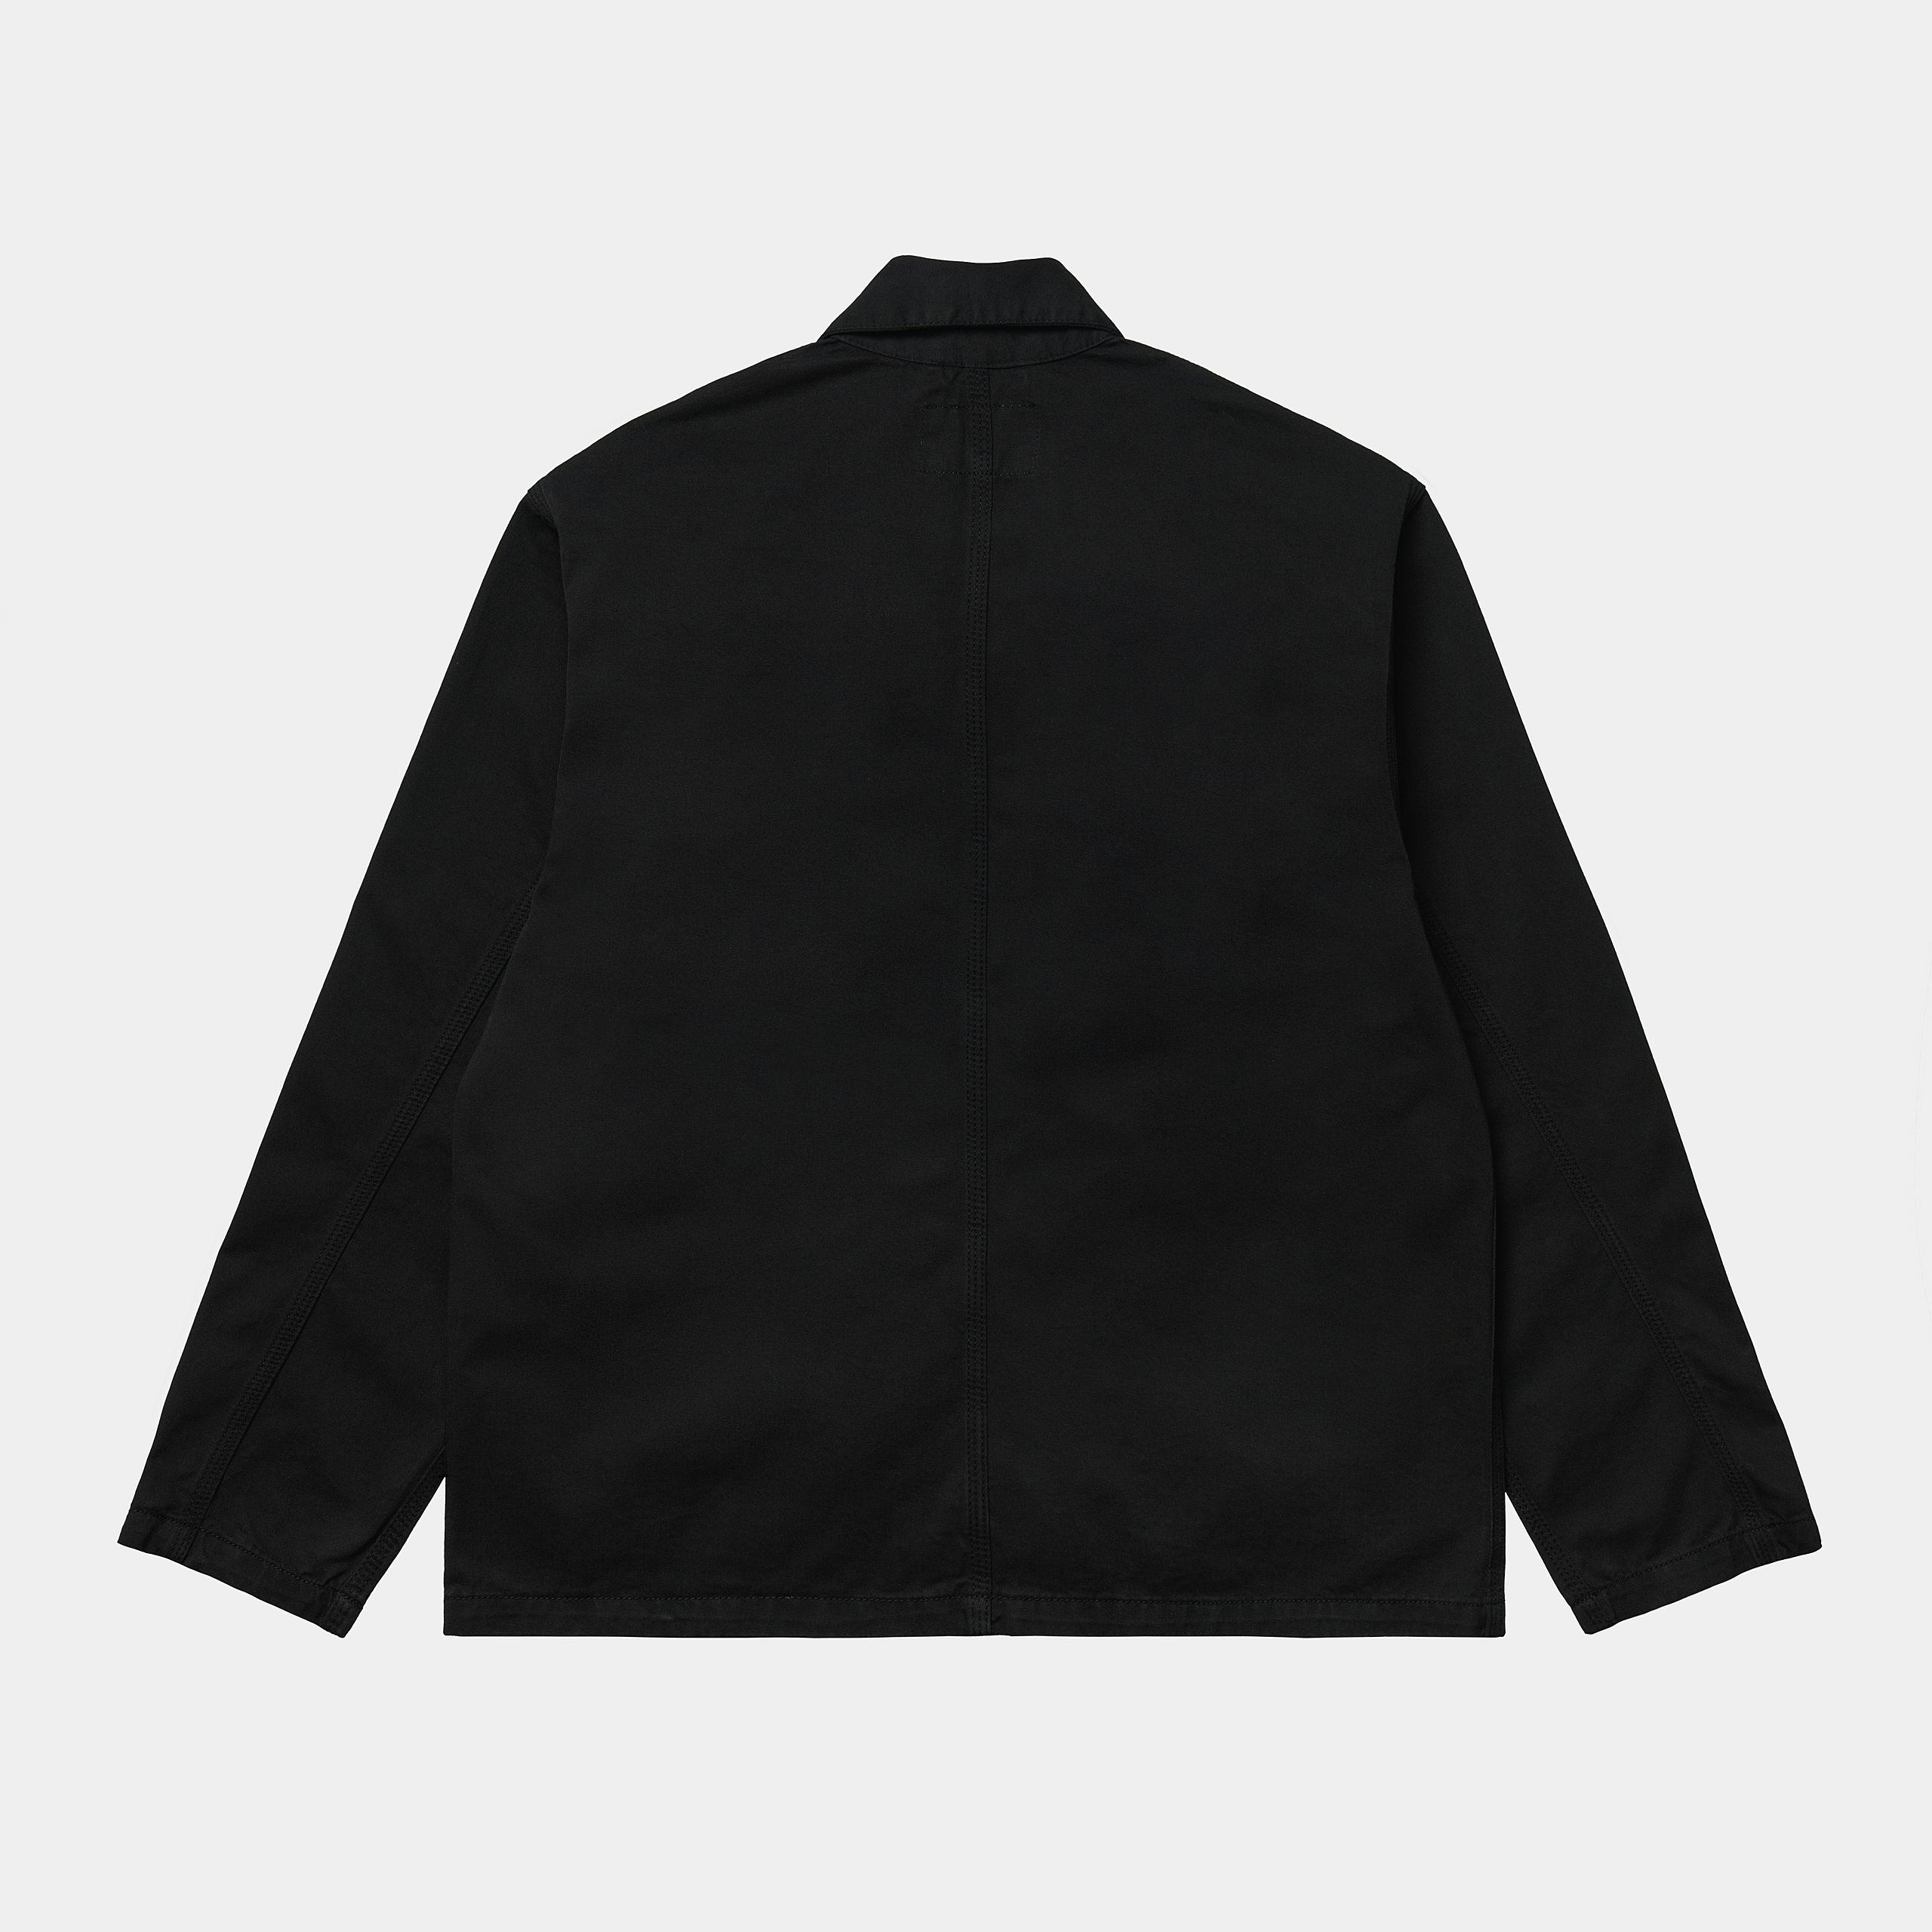 Carhartt WIP - W' MICHIGAN COAT - Black